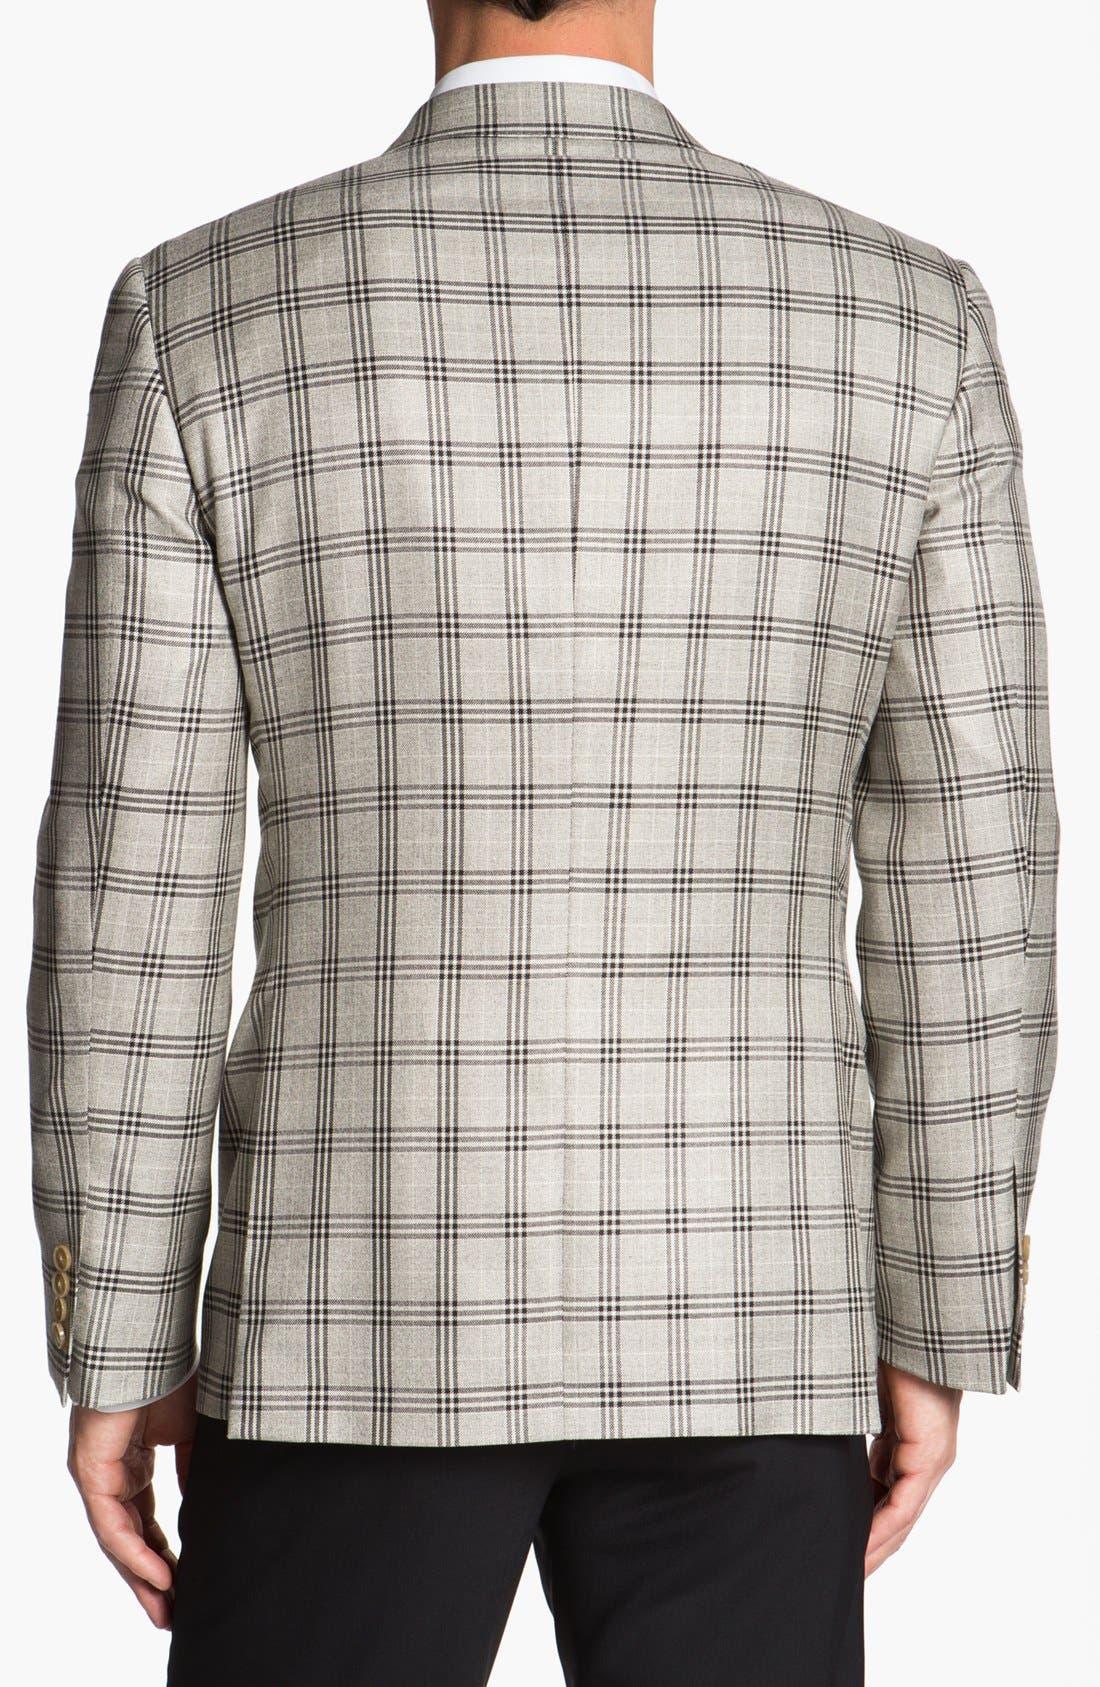 Alternate Image 3  - Joseph Abboud 'Platinum' Plaid Wool Sportcoat